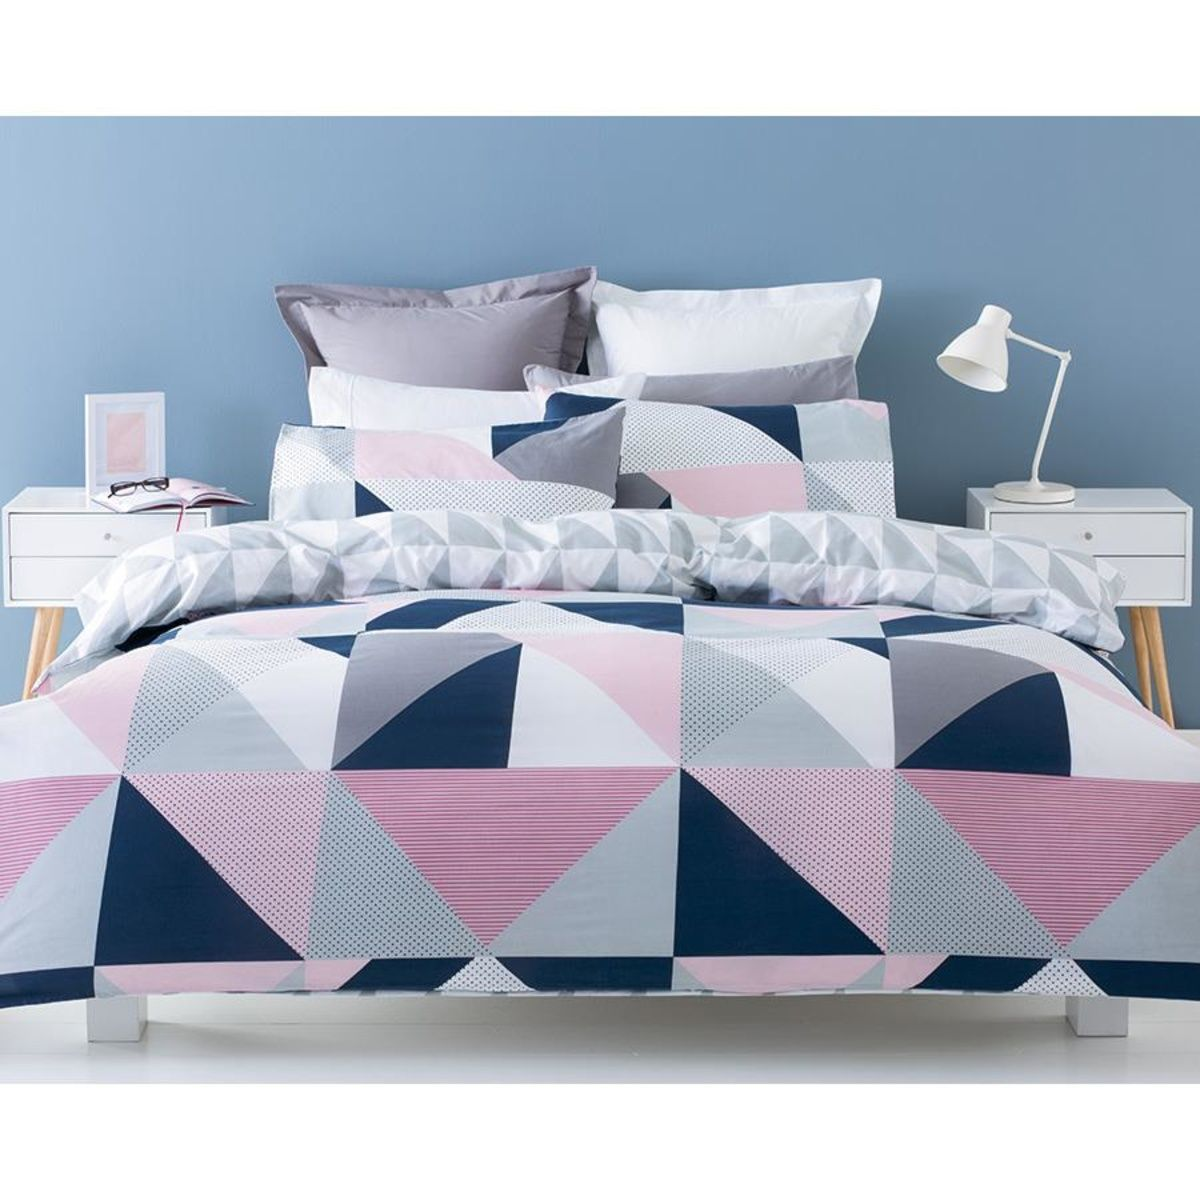 Jasper Reversible Quilt Cover Set - Single Bed   Kmart   GEOS ... : quilt covers single bed - Adamdwight.com